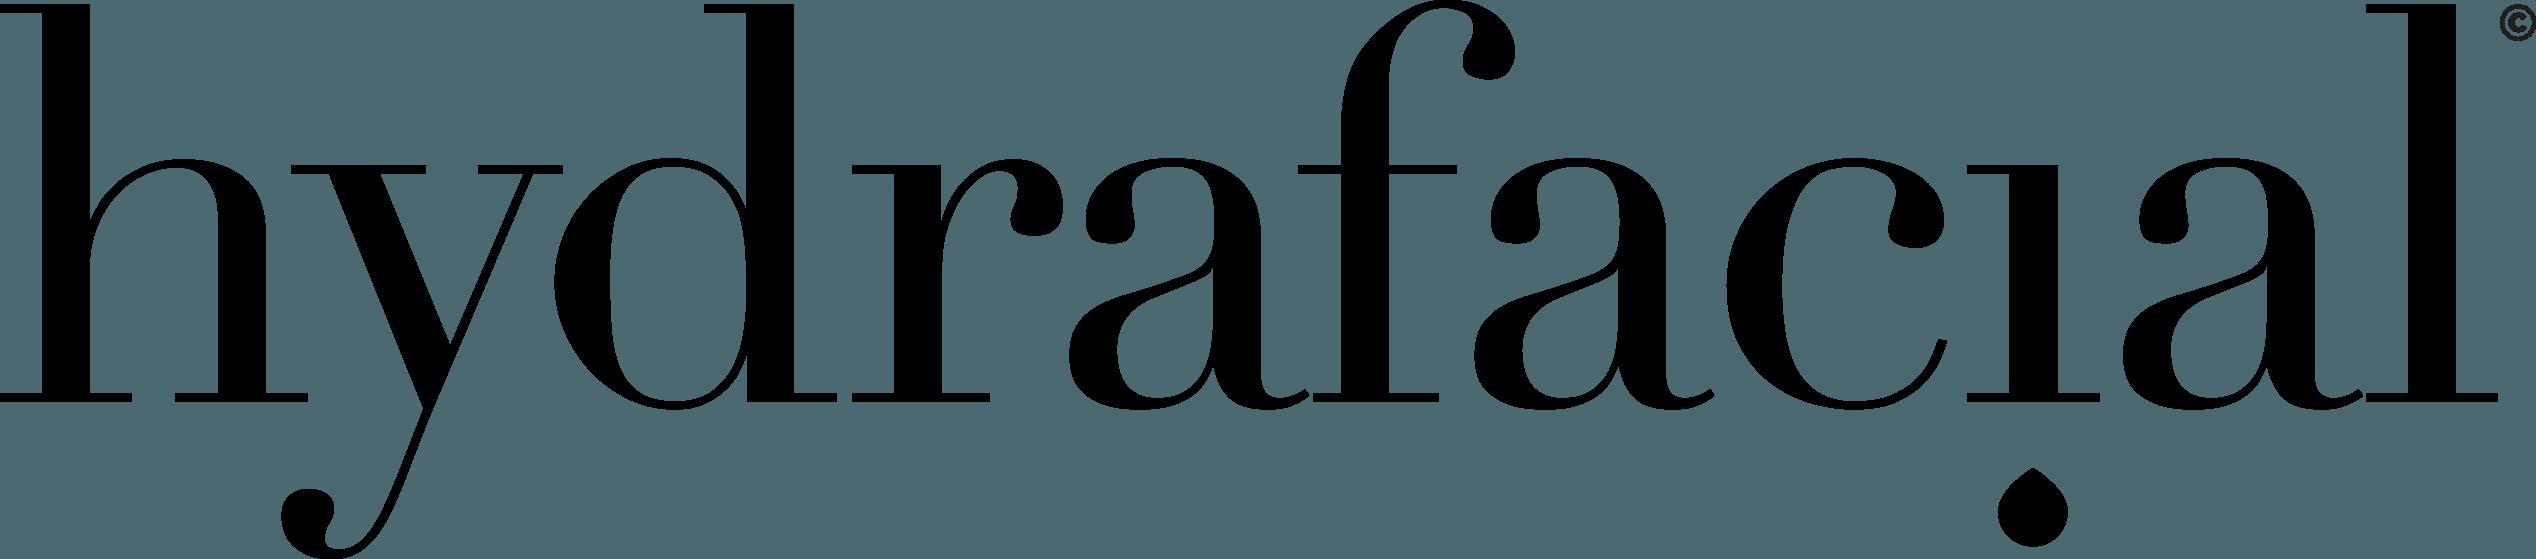 HydraFacial_Logo_Black The HydraFacial